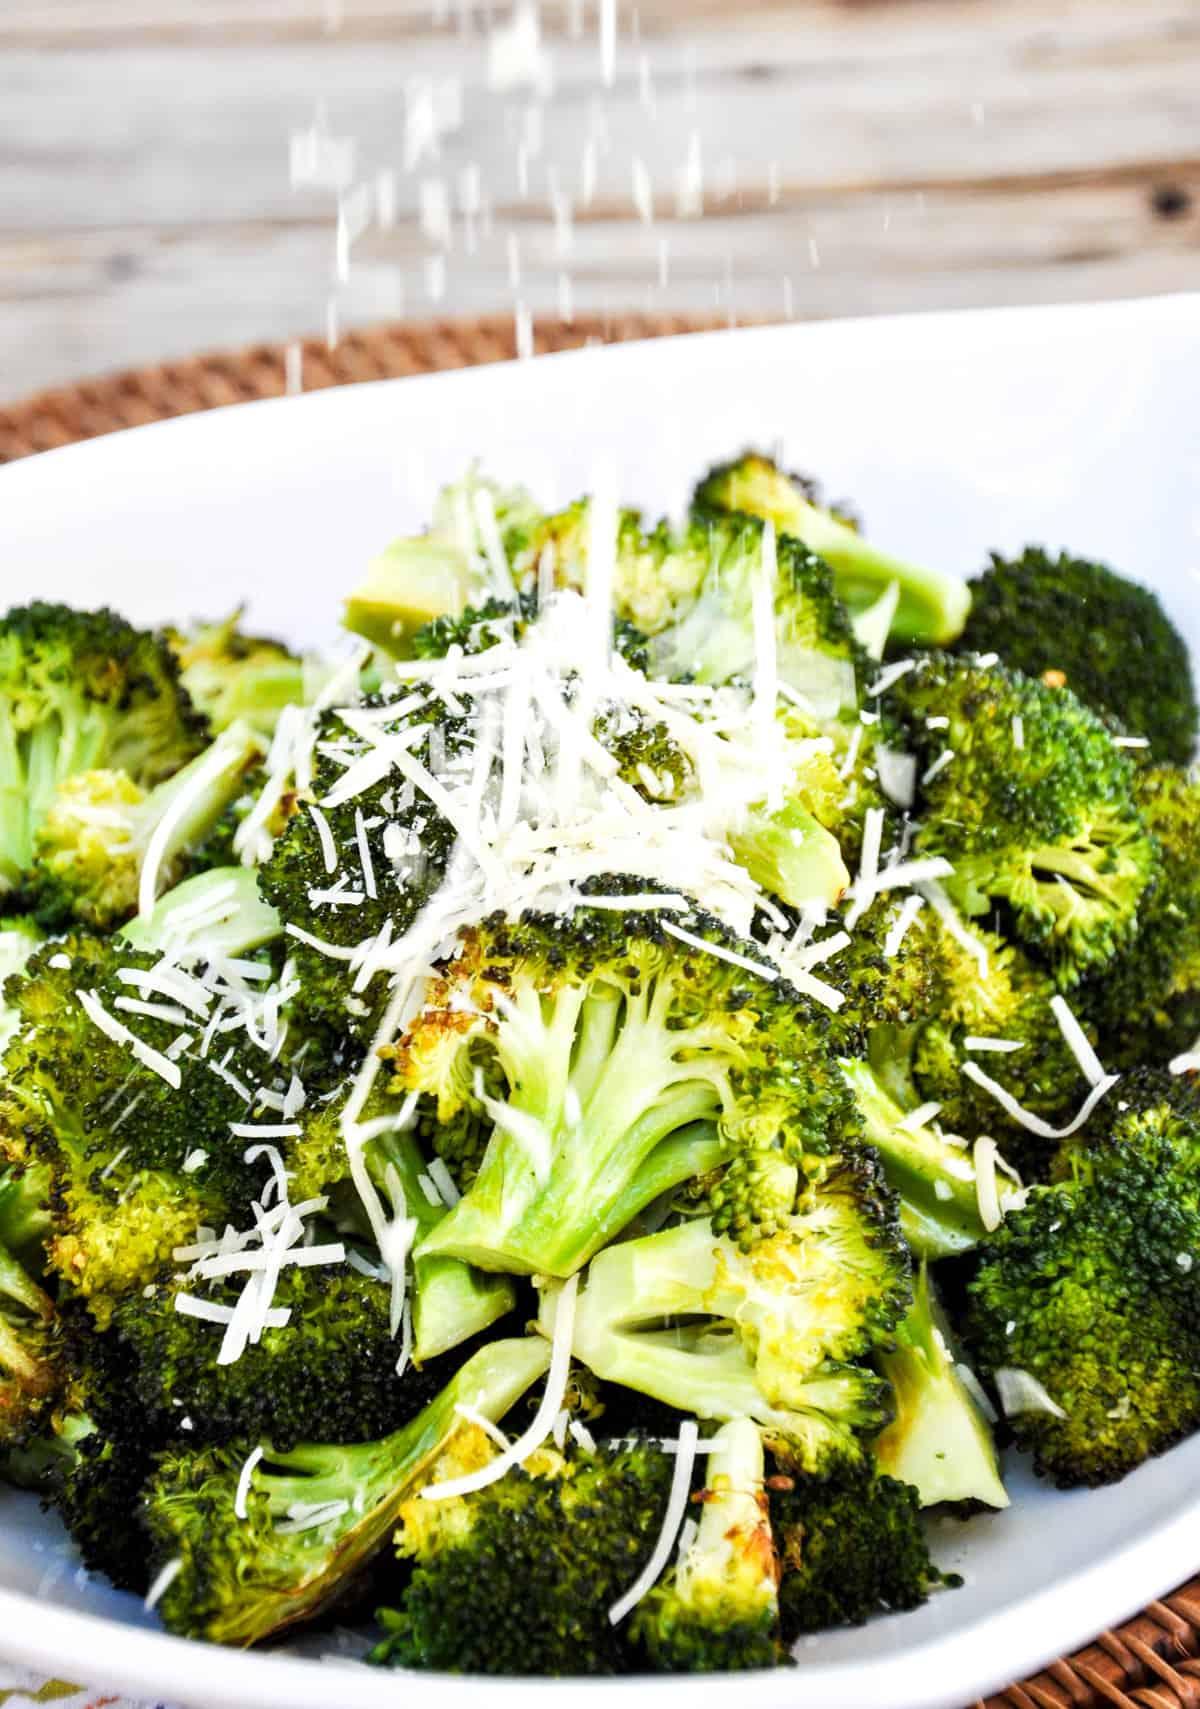 Roasted Garlic Broccoli with Parmesan